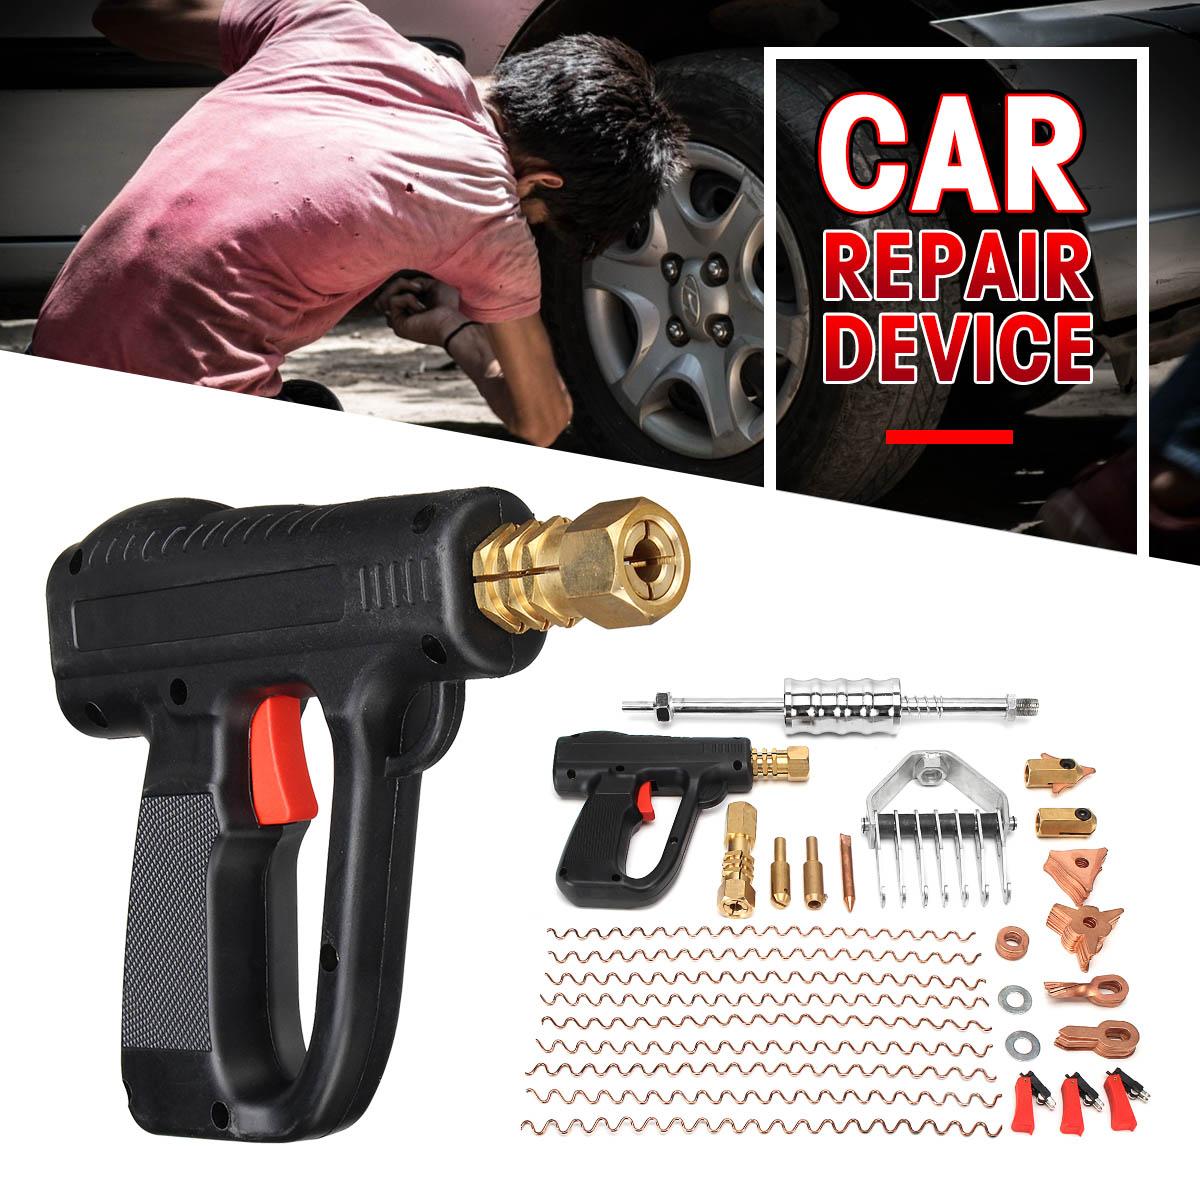 66Pcs/Set Dent Repair Puller Kit Car Tools Hand Body Spot Guns Mini Welding Machine Auto System Spotter Fix Clamp Hammer Removal